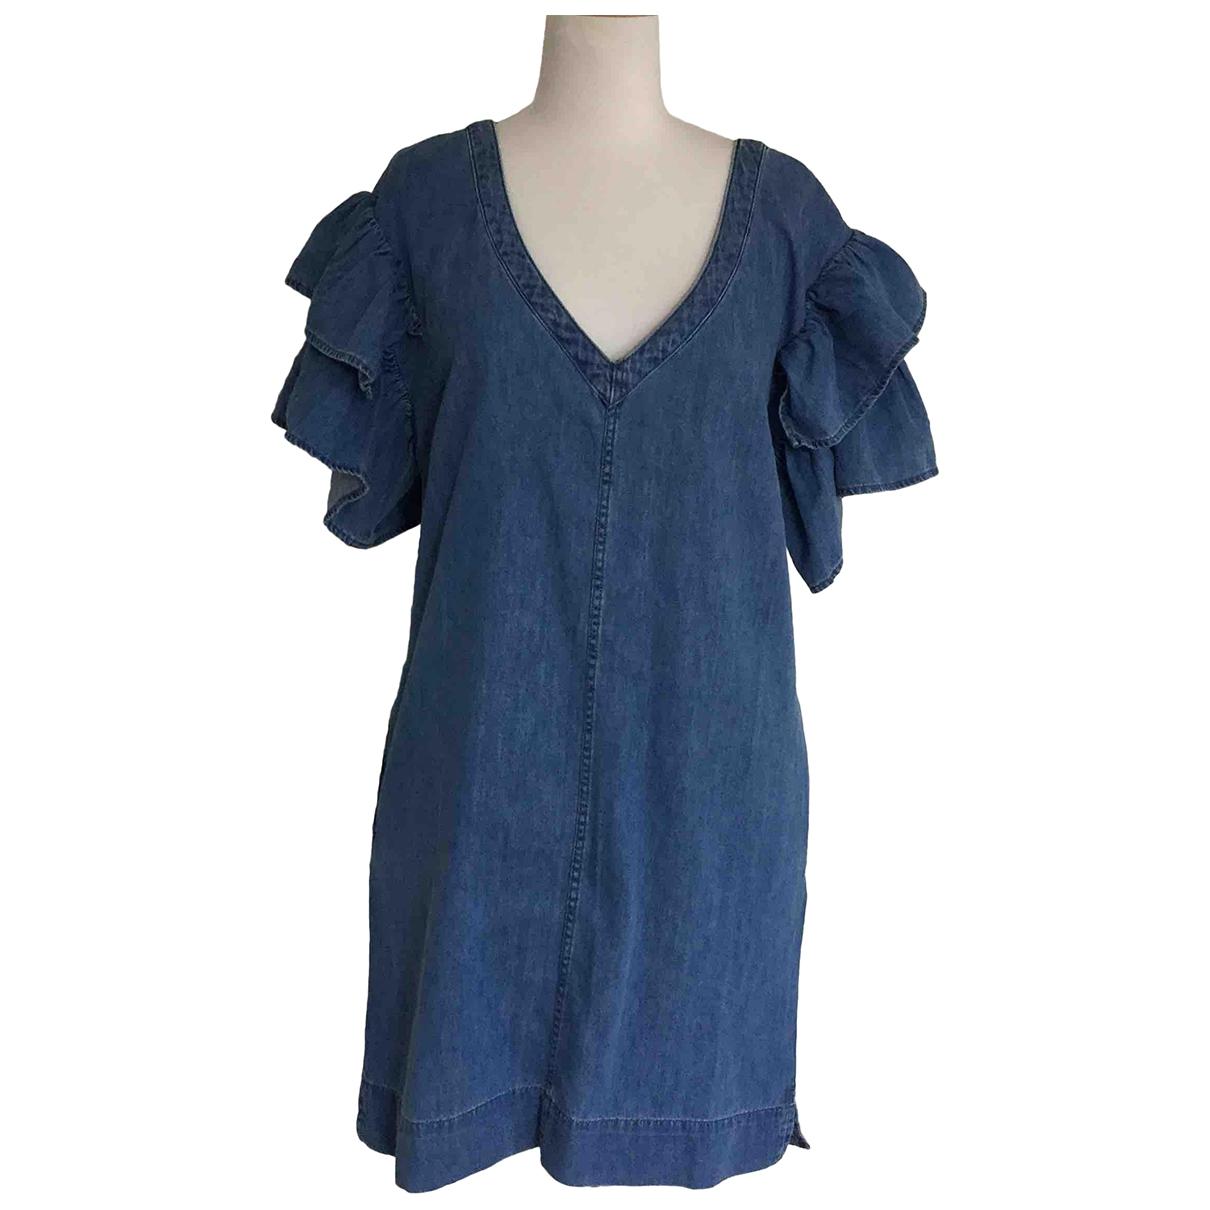 7 For All Mankind \N Kleid in  Blau Denim - Jeans